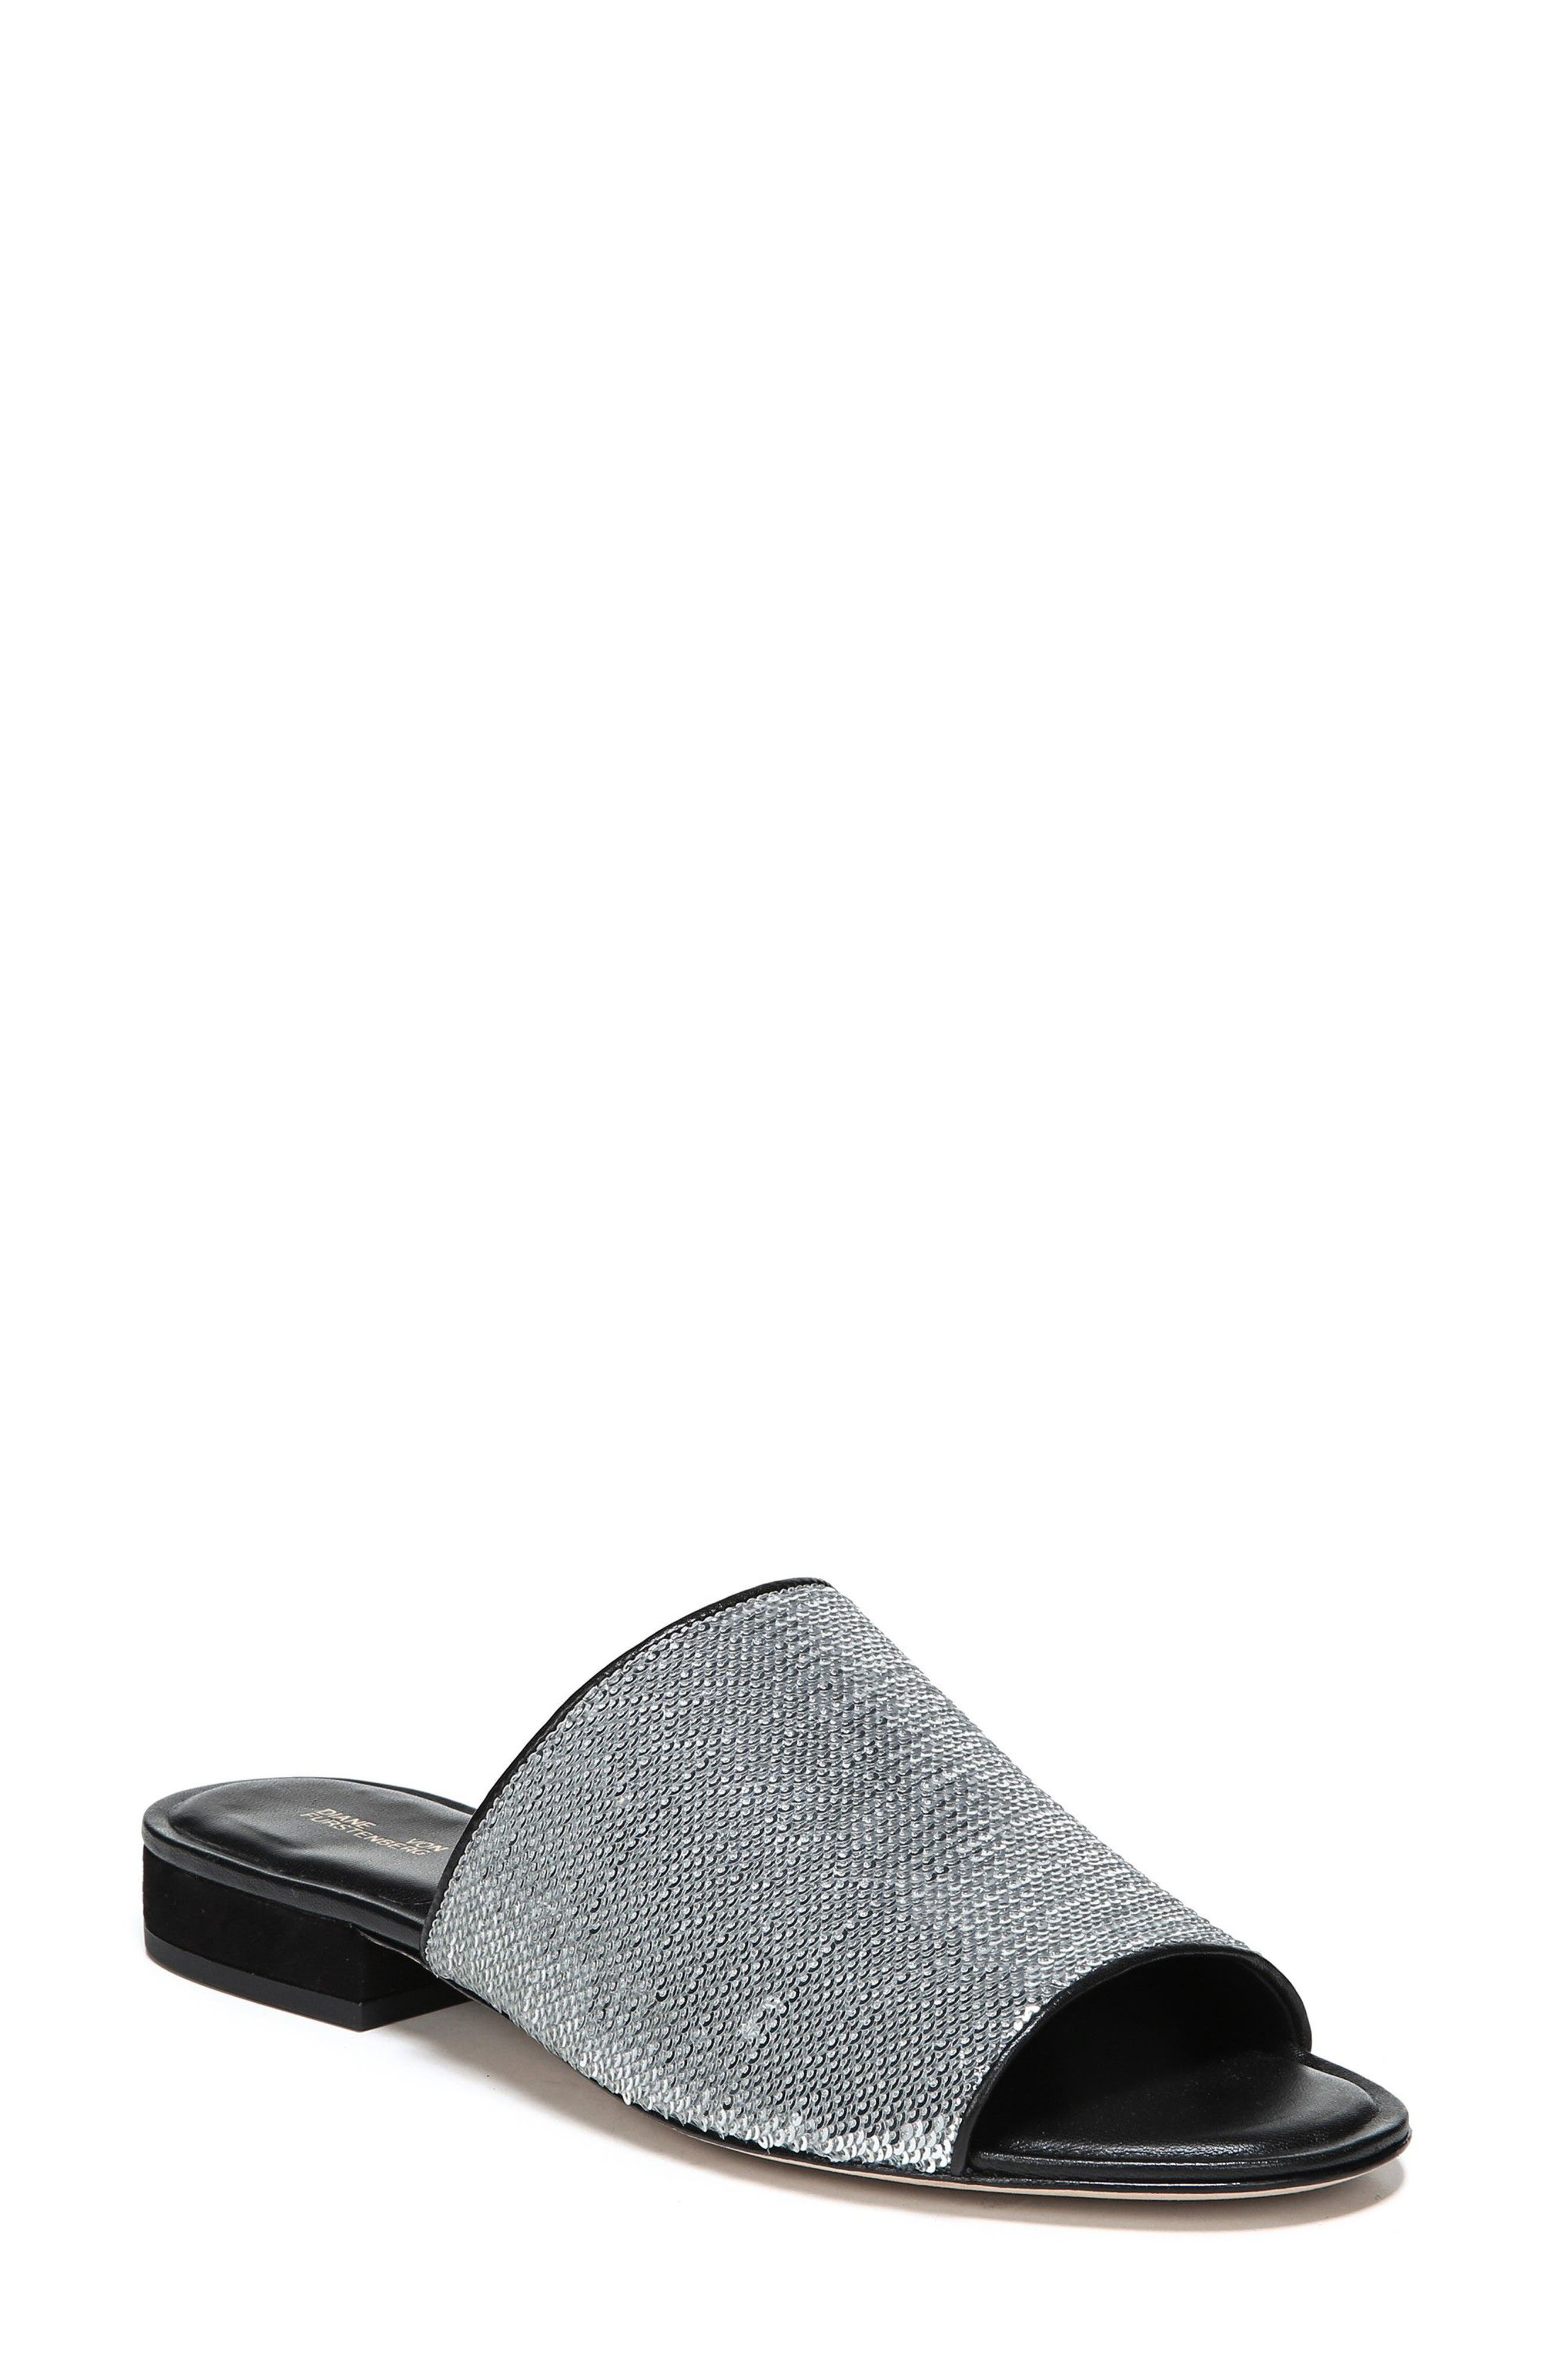 Samassi 1 Slide Sandal,                             Main thumbnail 1, color,                             Silver Sequins